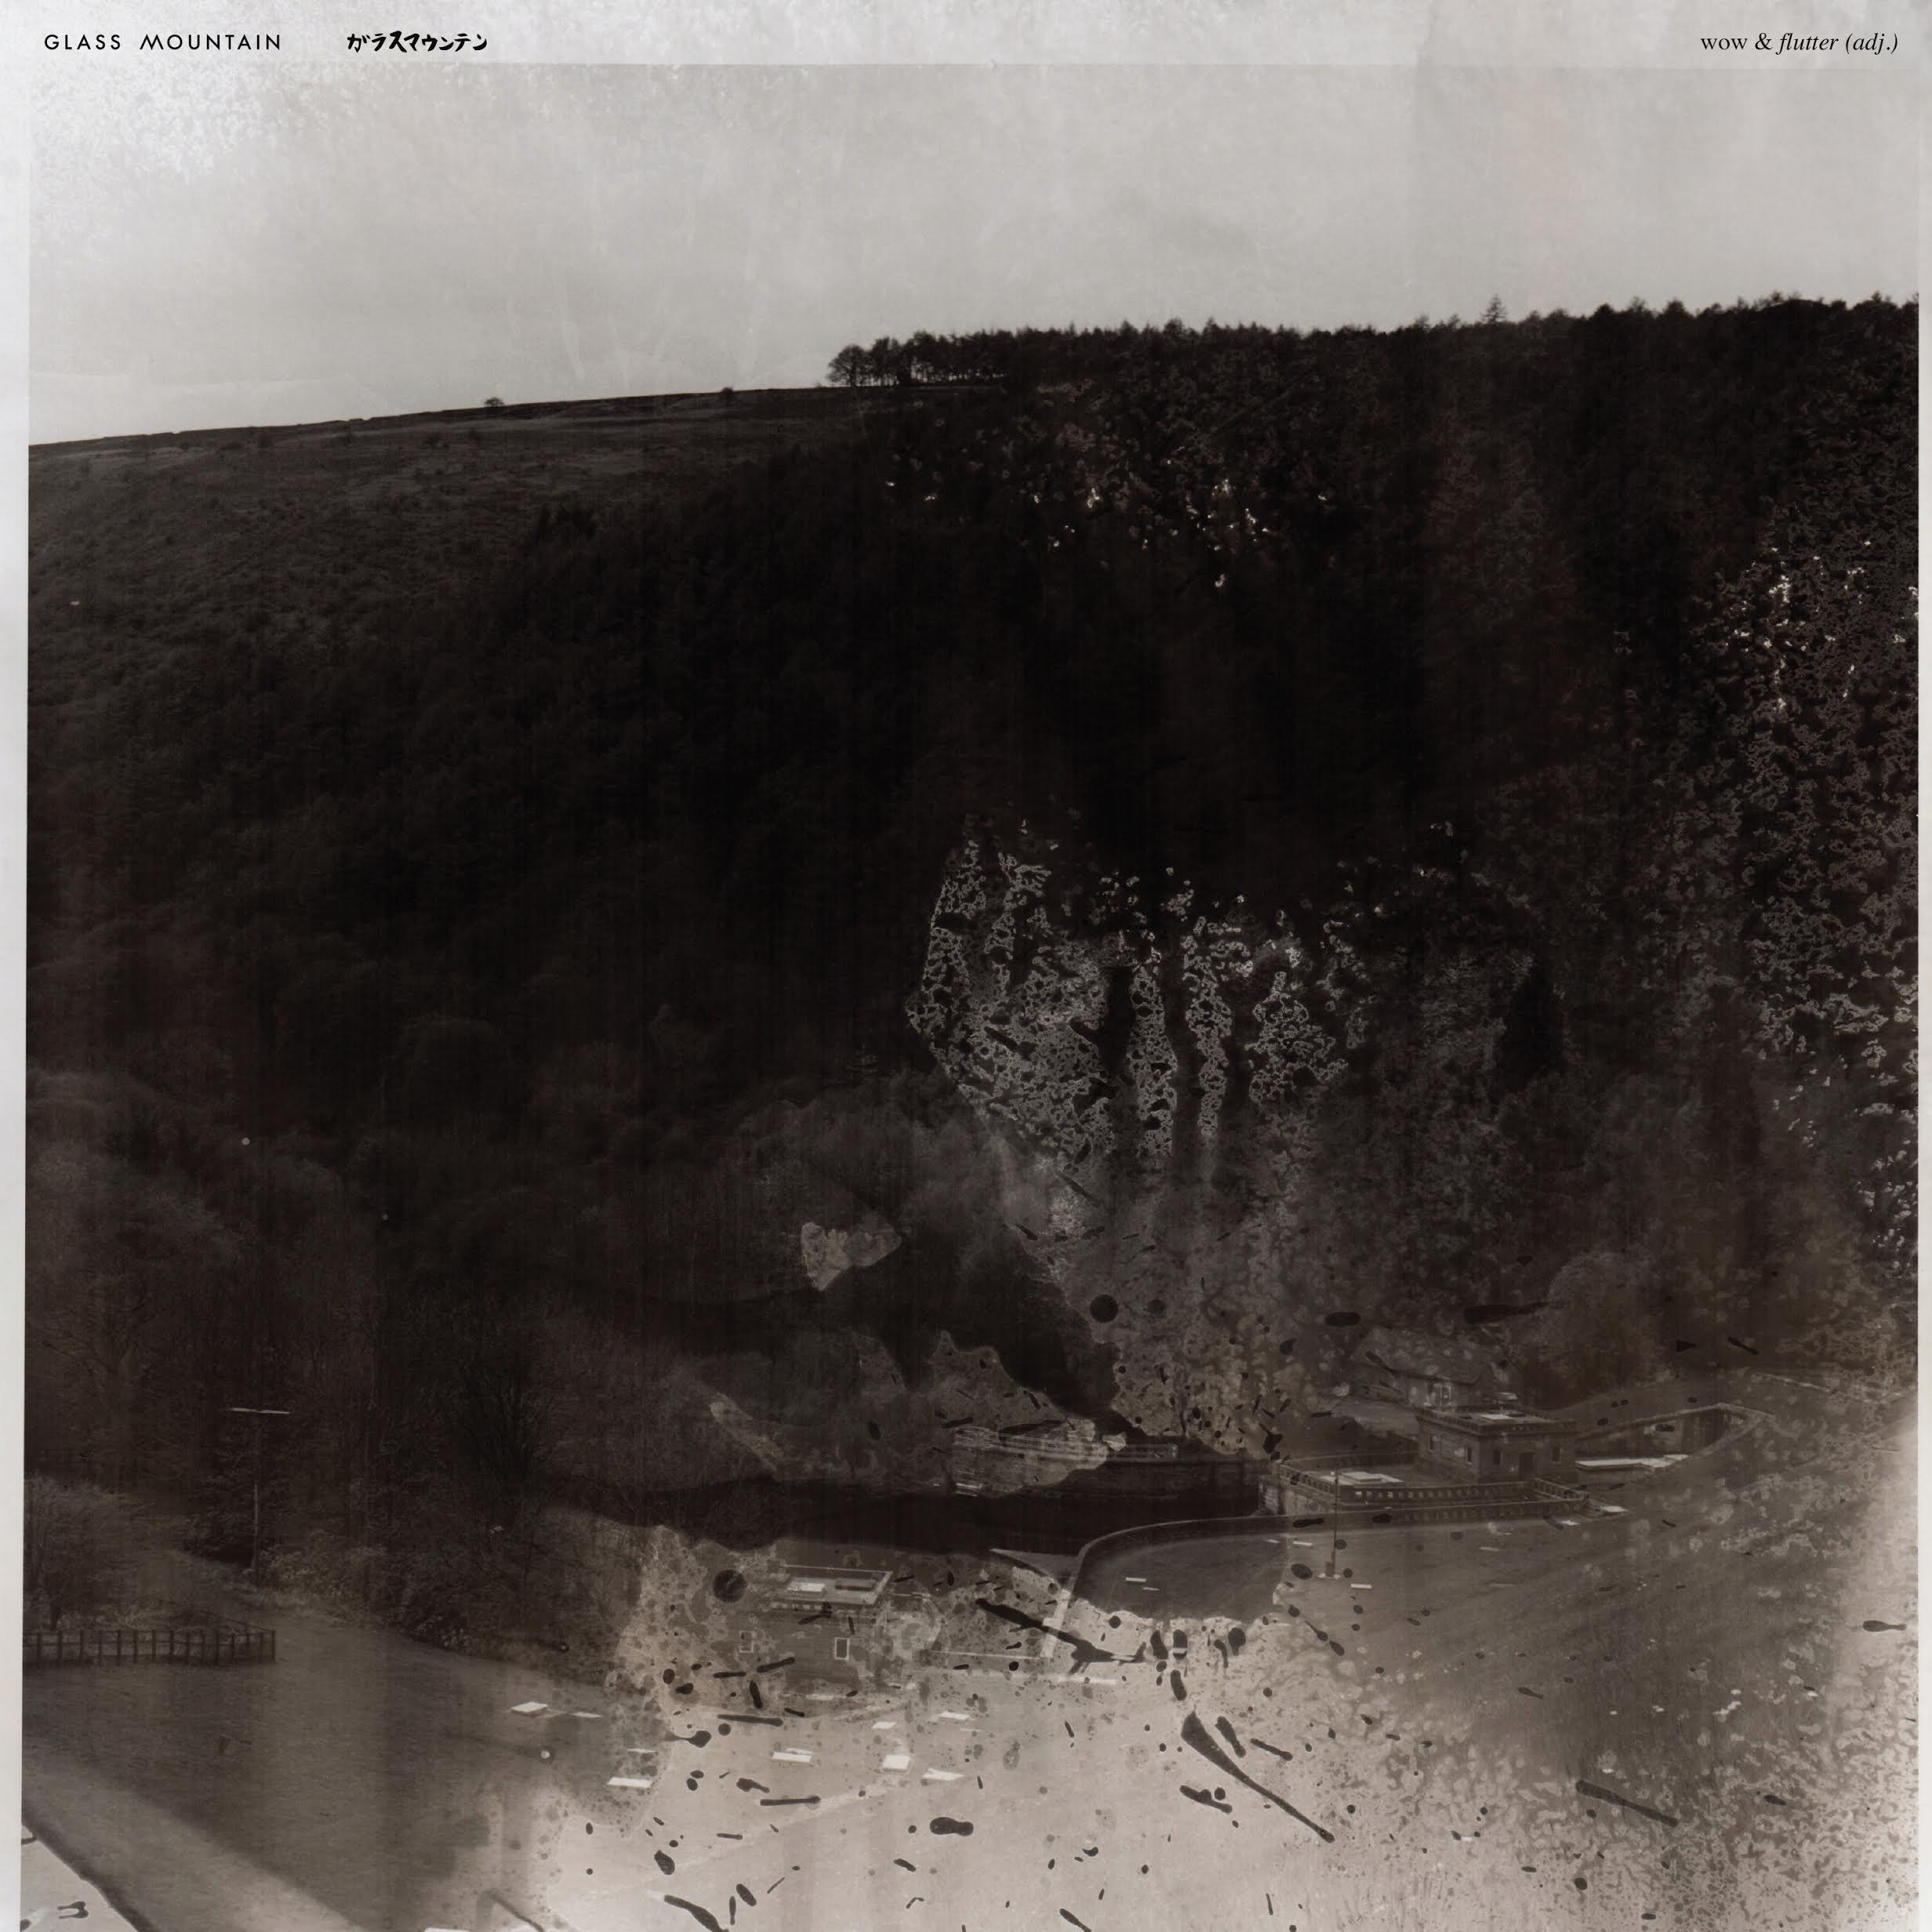 Glass Mountain - Wow & Flutter (Vinyl EP & CD) - Hide & Seek Records